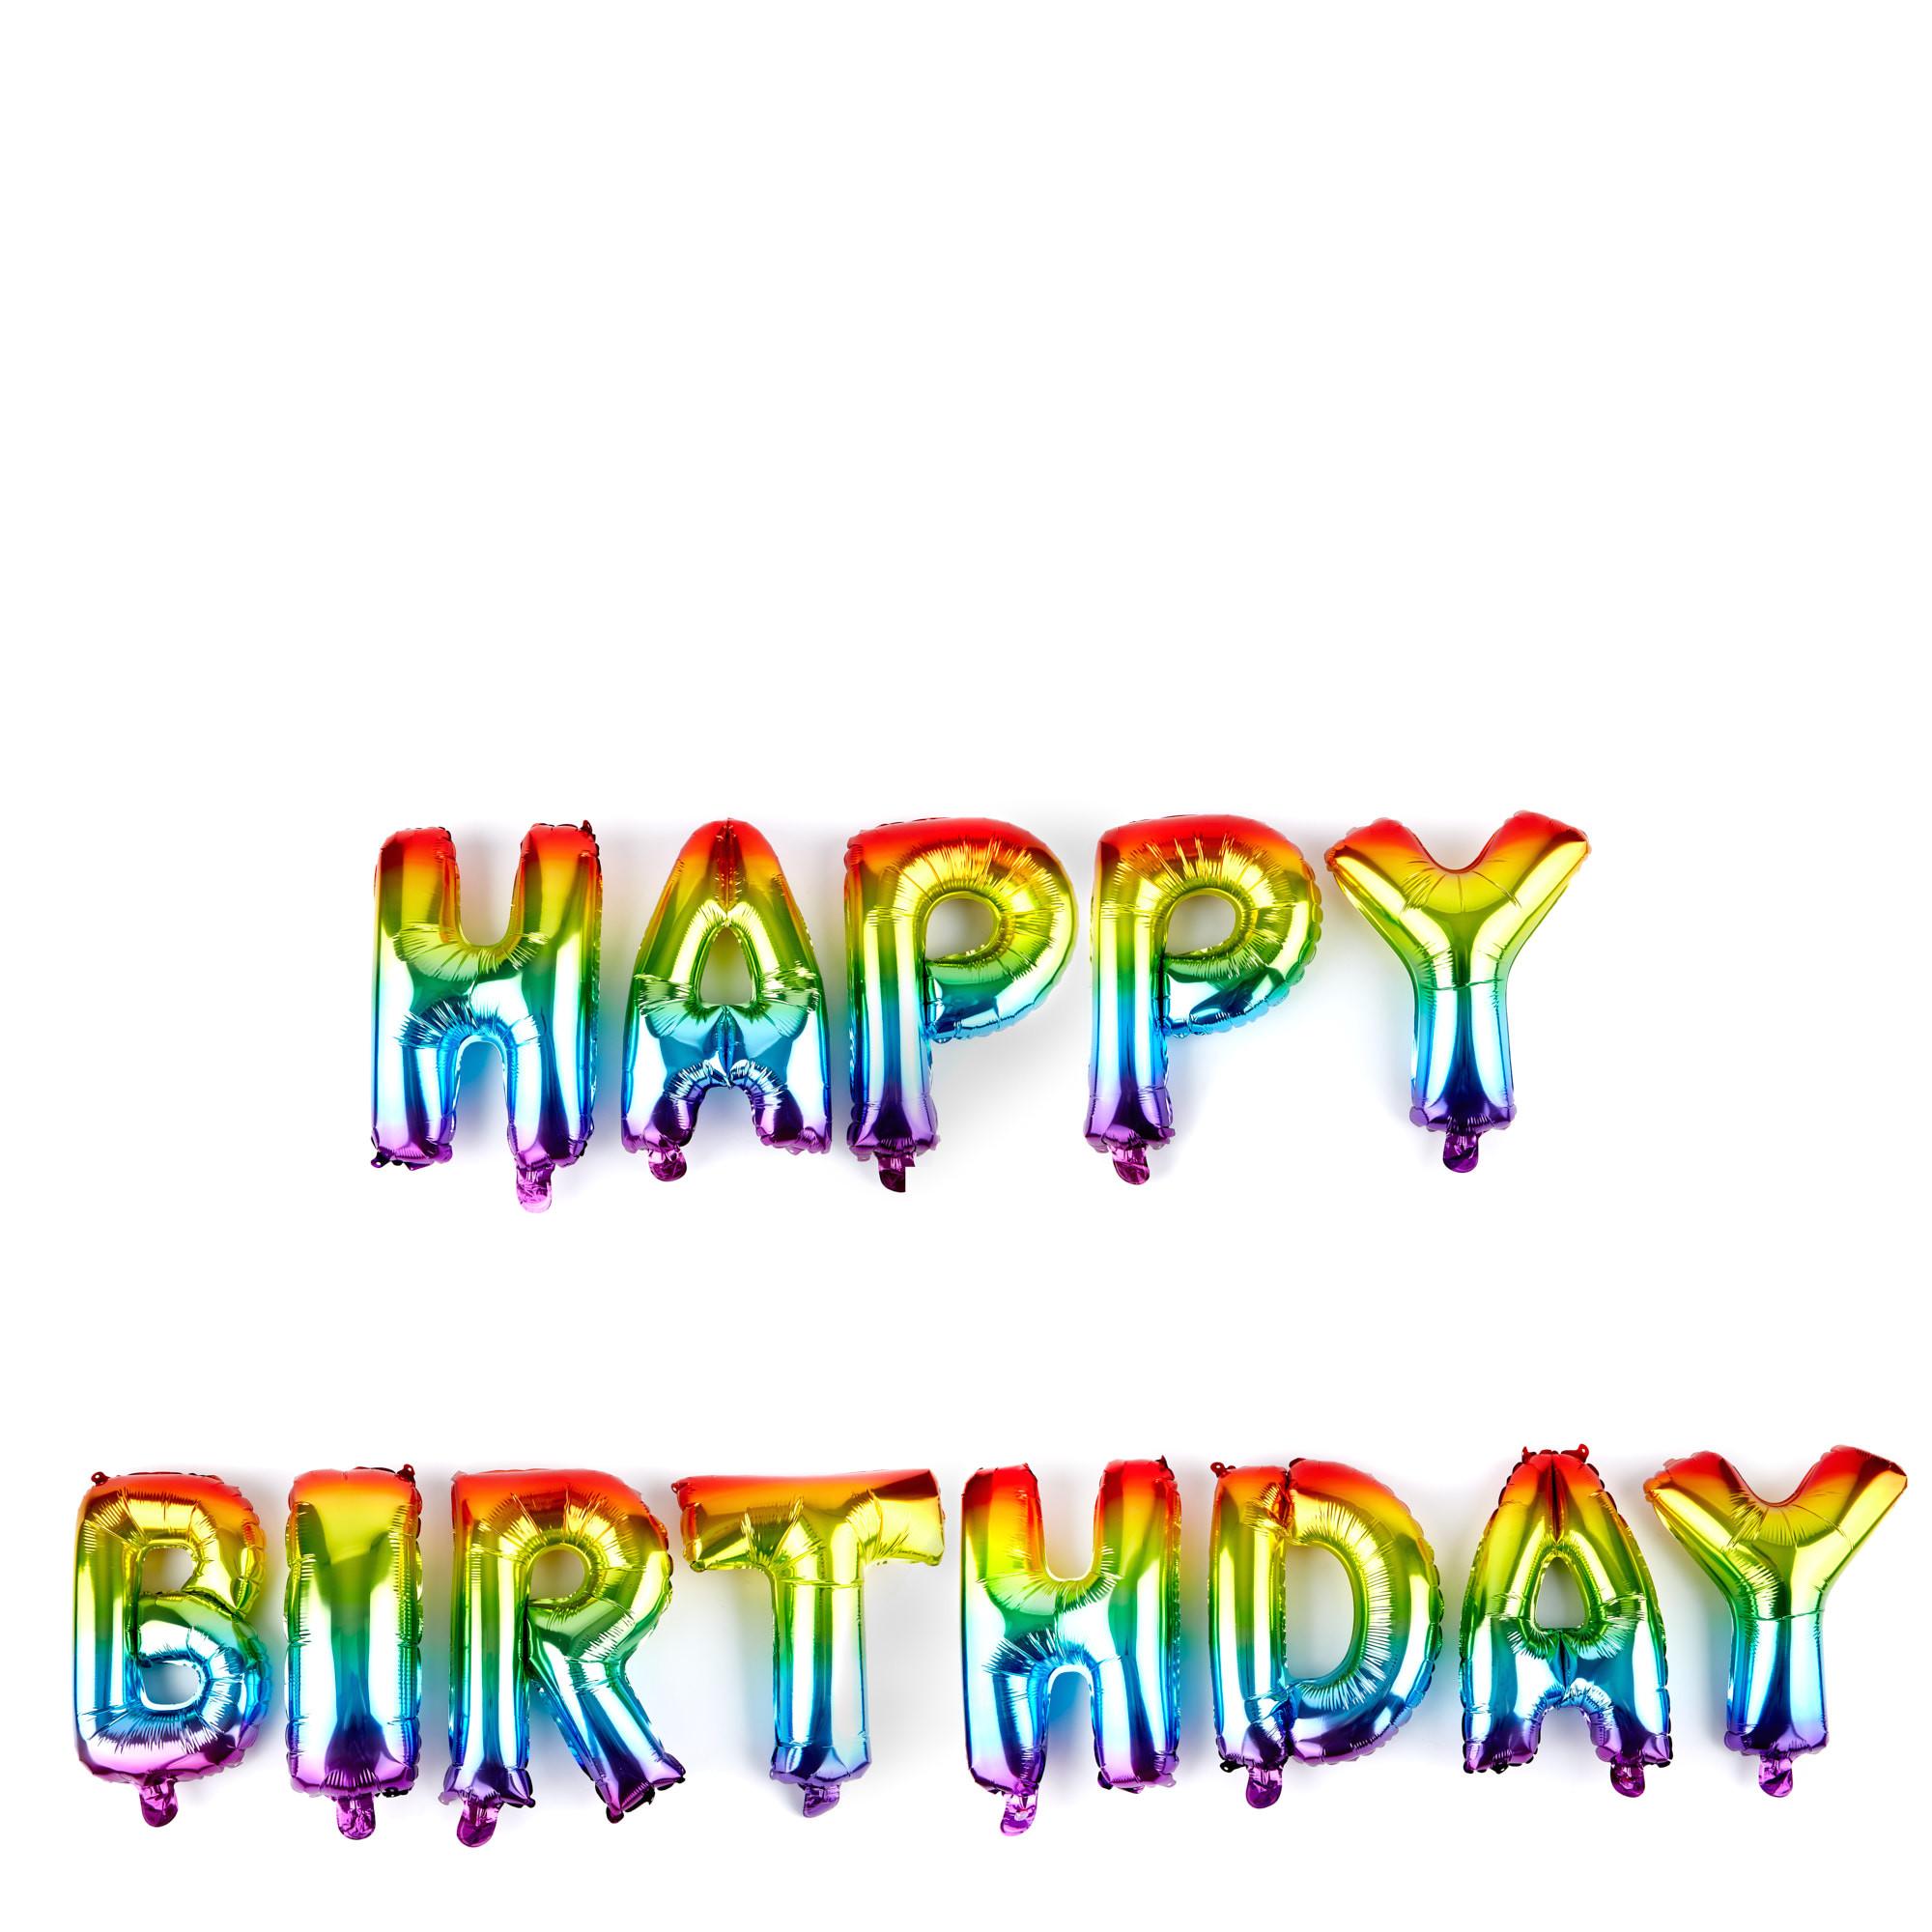 Happy Birthday Banner Card Factory Buy Happy Birthday Rainbow Balloon Banner Kit for Gbp 9 99